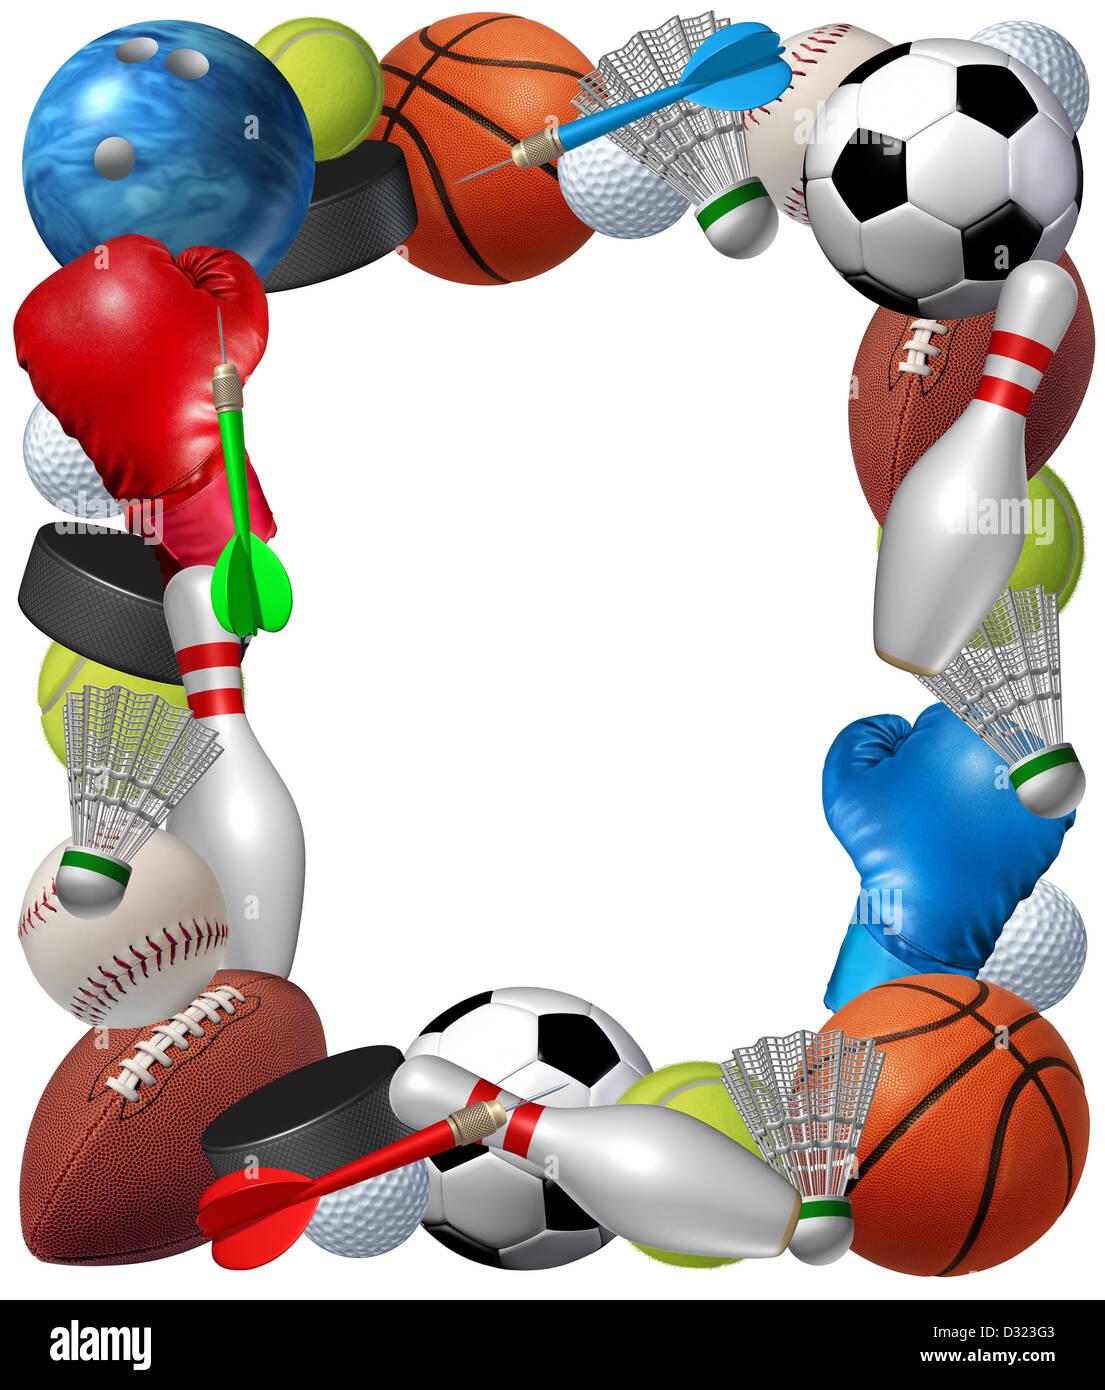 Sport Rahmen mit Sportgeräten aus Basketball Boxen Golf Tennis ...